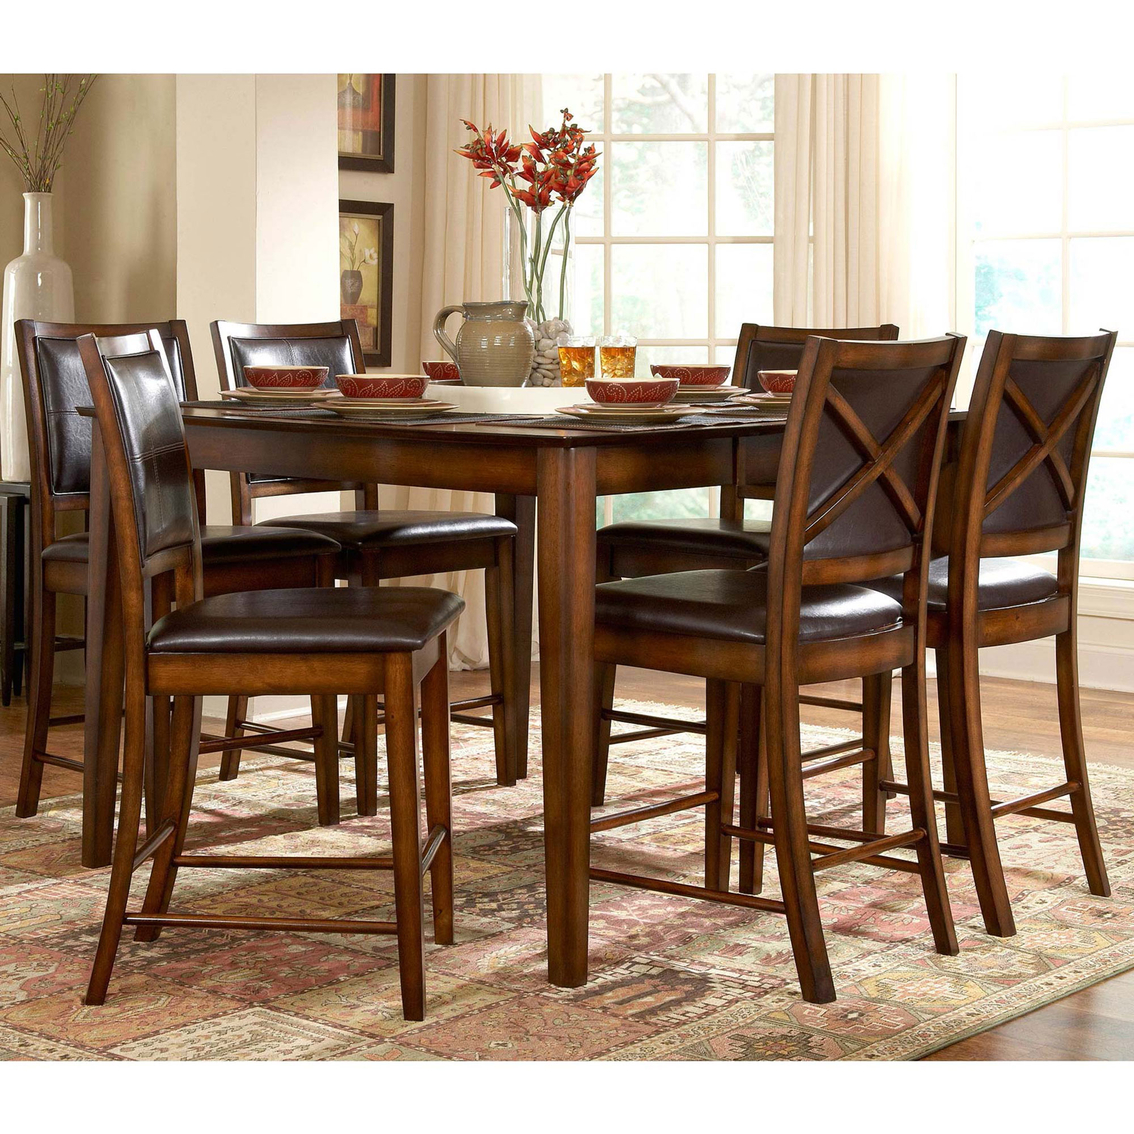 Homelegance Verona 5 Pc Counter Height Dining Set Dining Sets  # Muebles Seys Verona